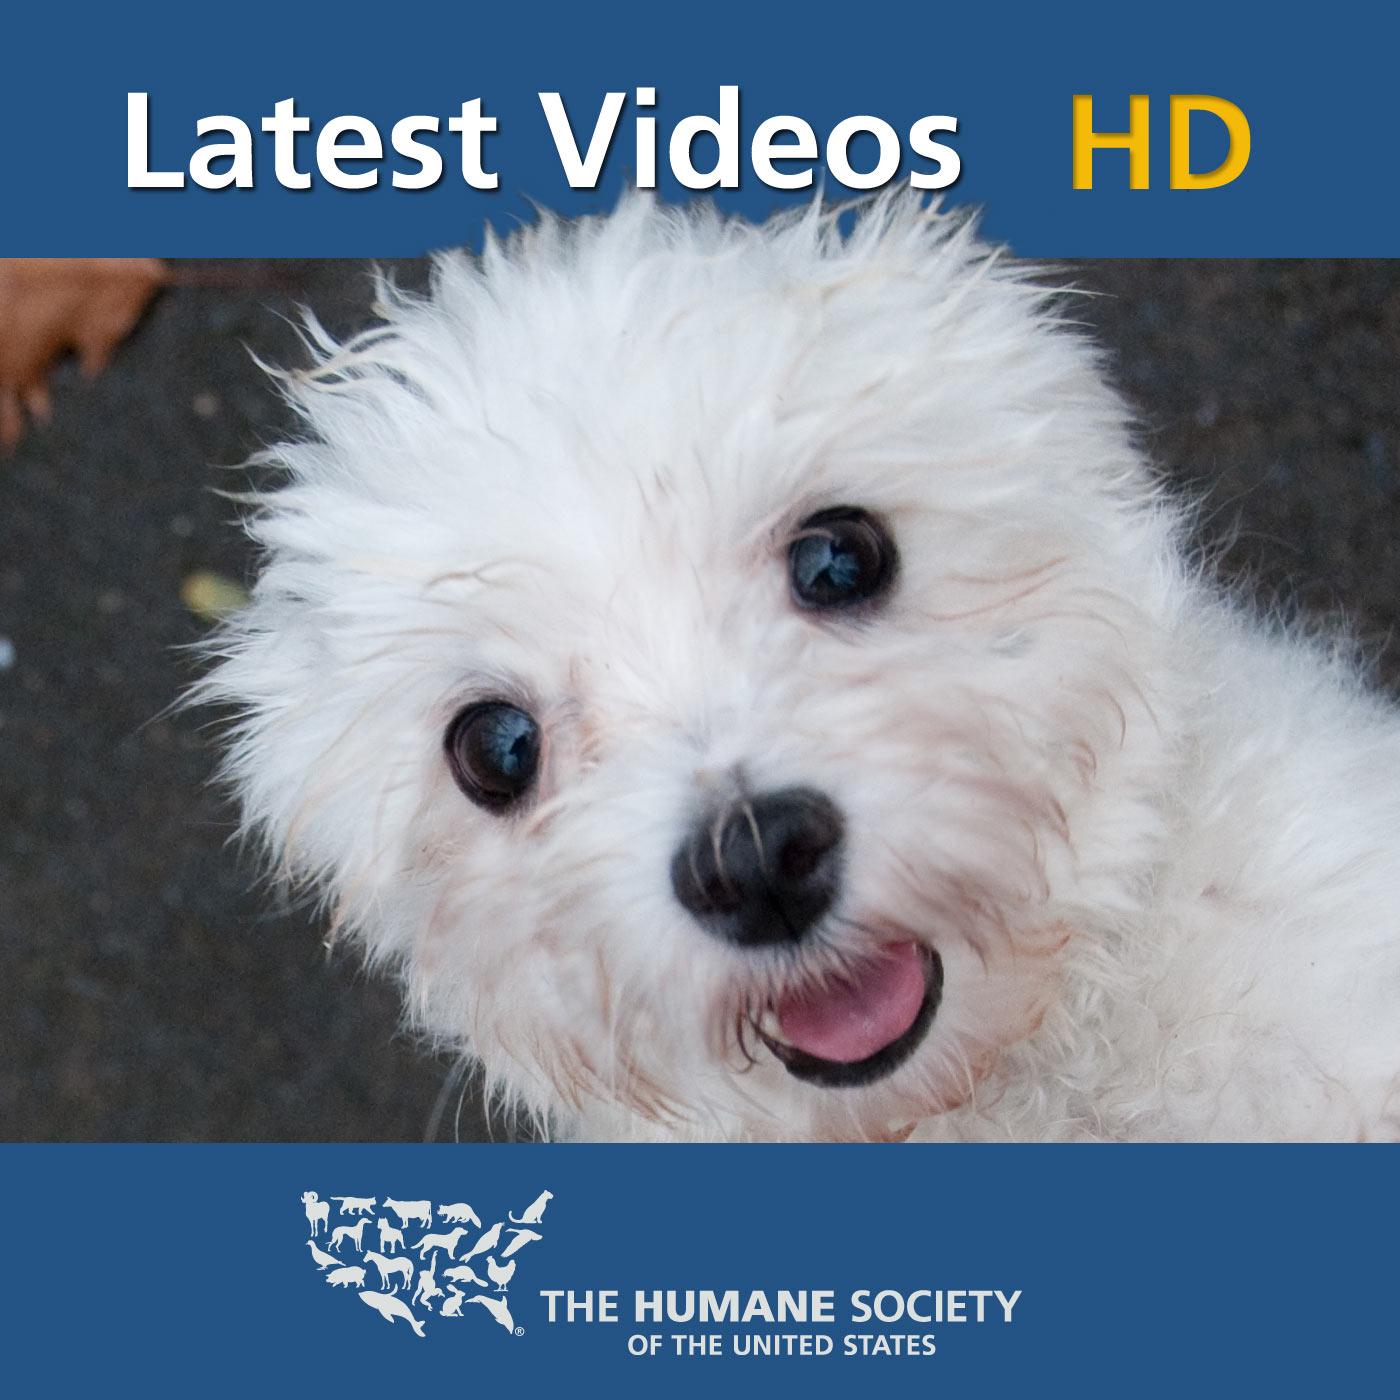 Humane Society: HD Latest Videos